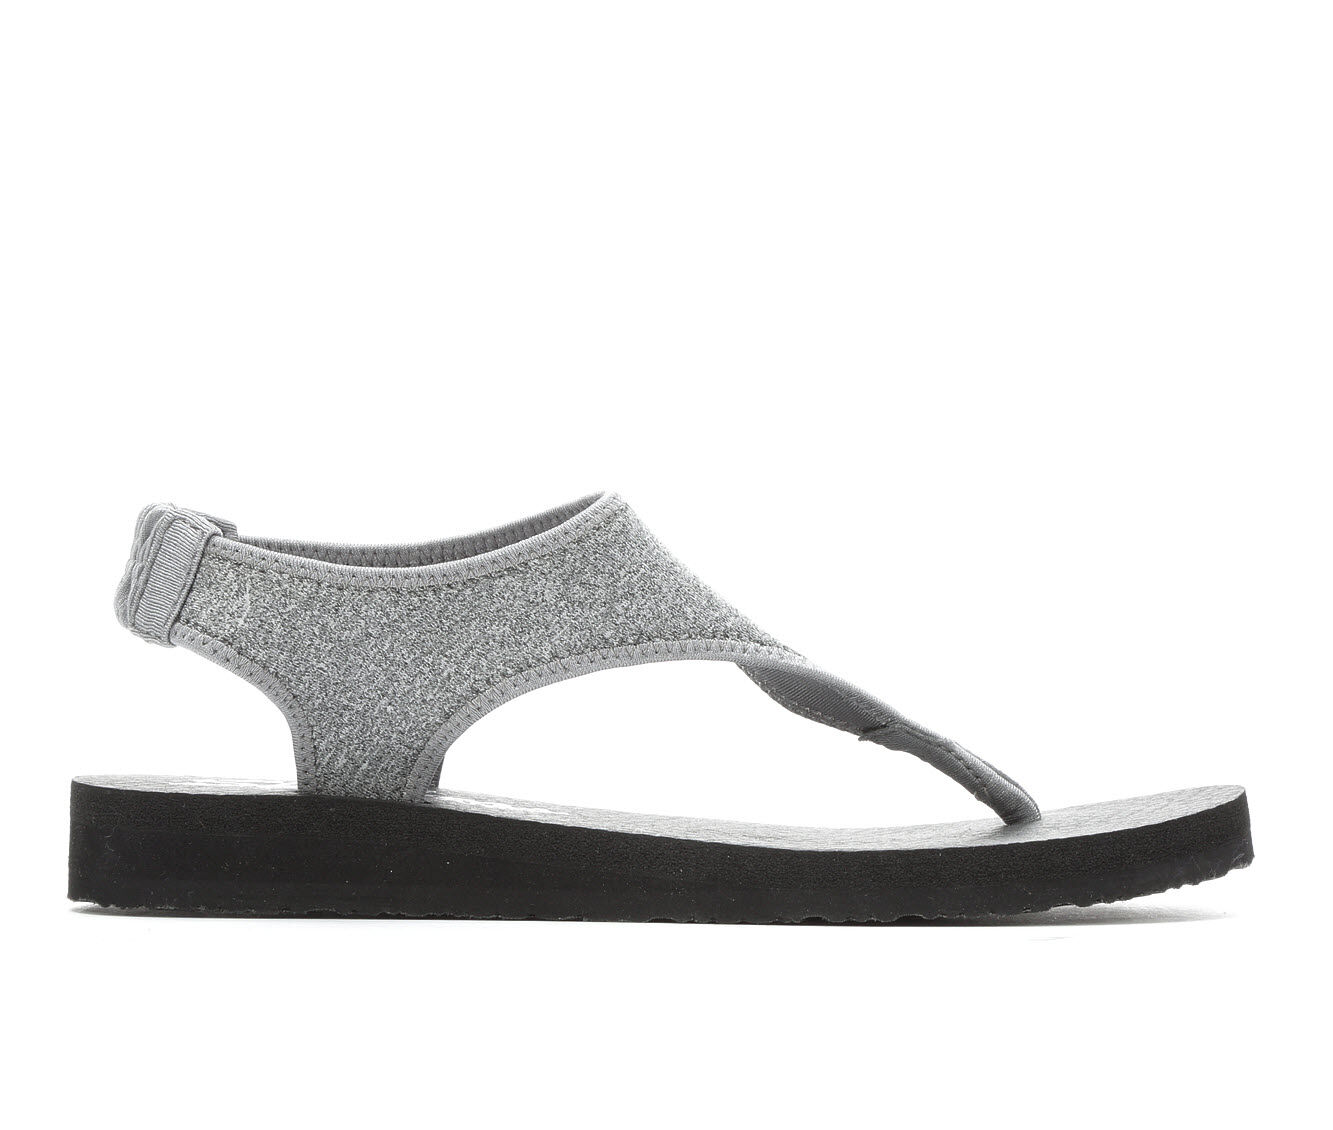 Women's Skechers Cali Meditation Flow Nat Sandals Grey